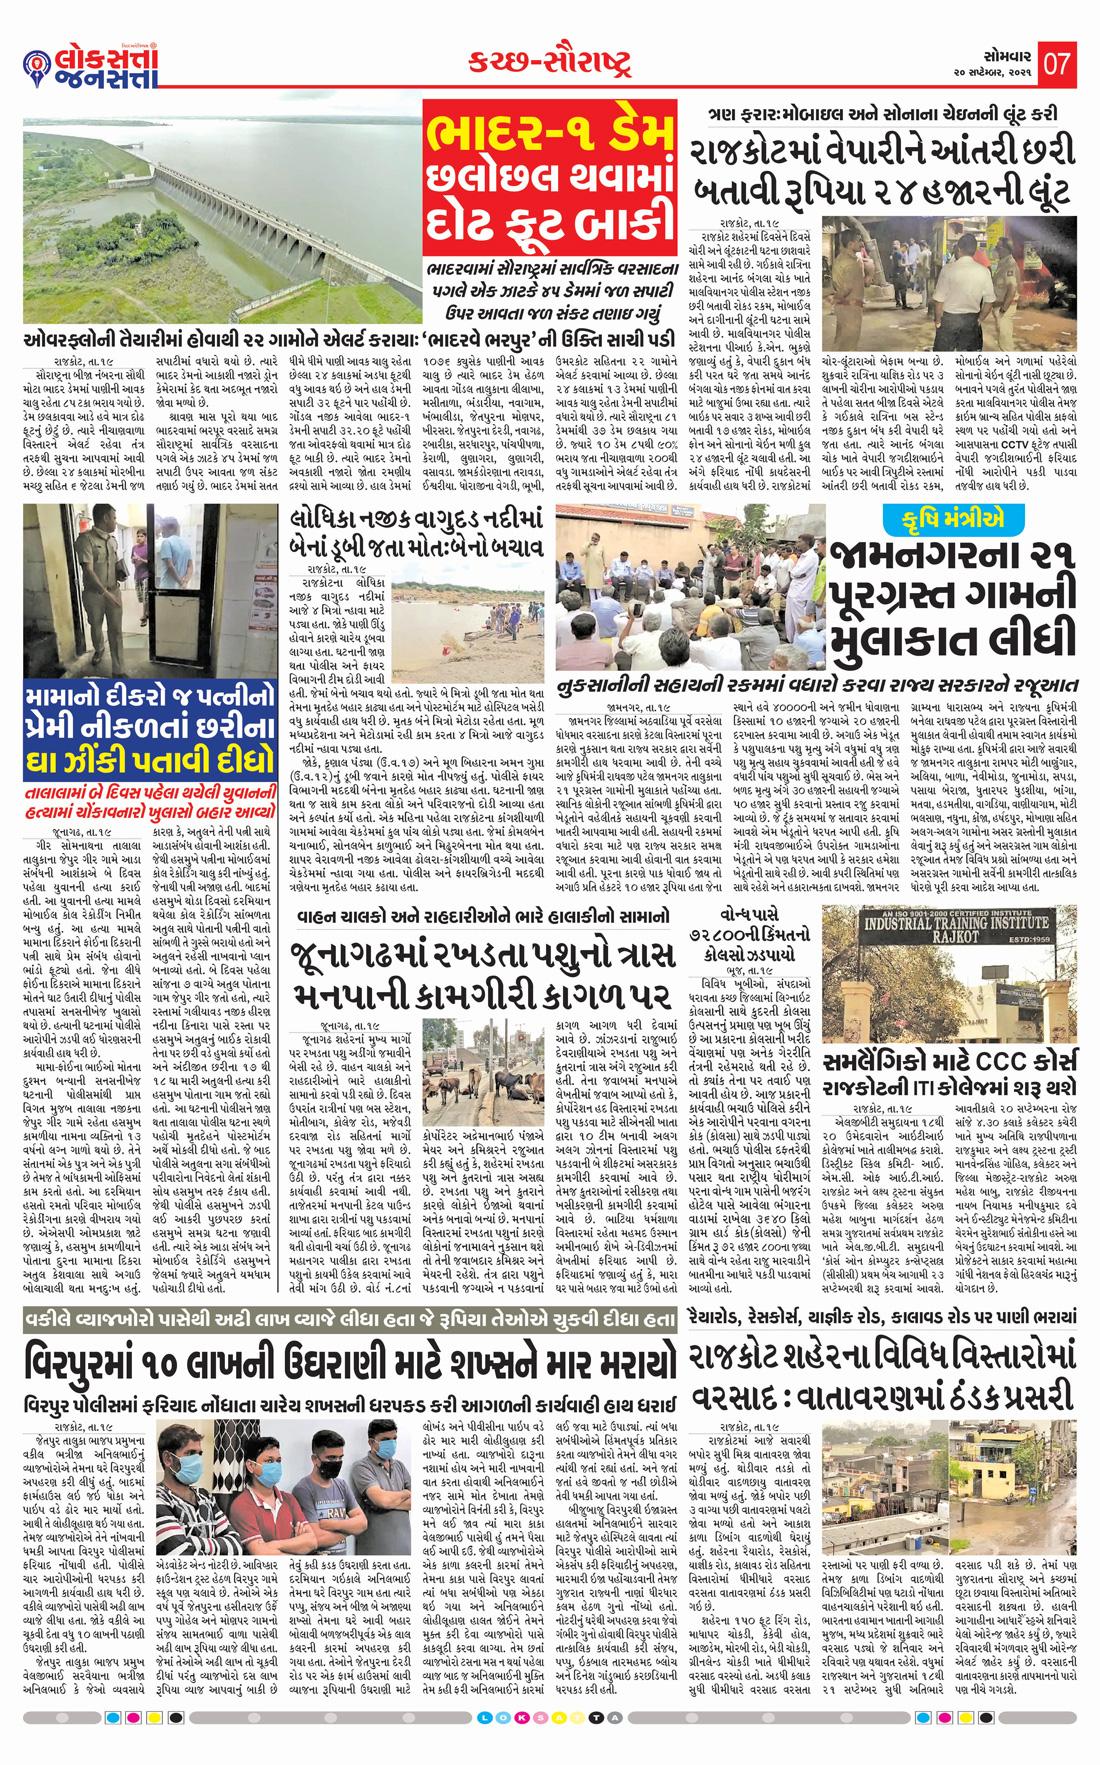 Loksatta Jansatta News Papaer E-paper dated 2021-09-20 | Page 7